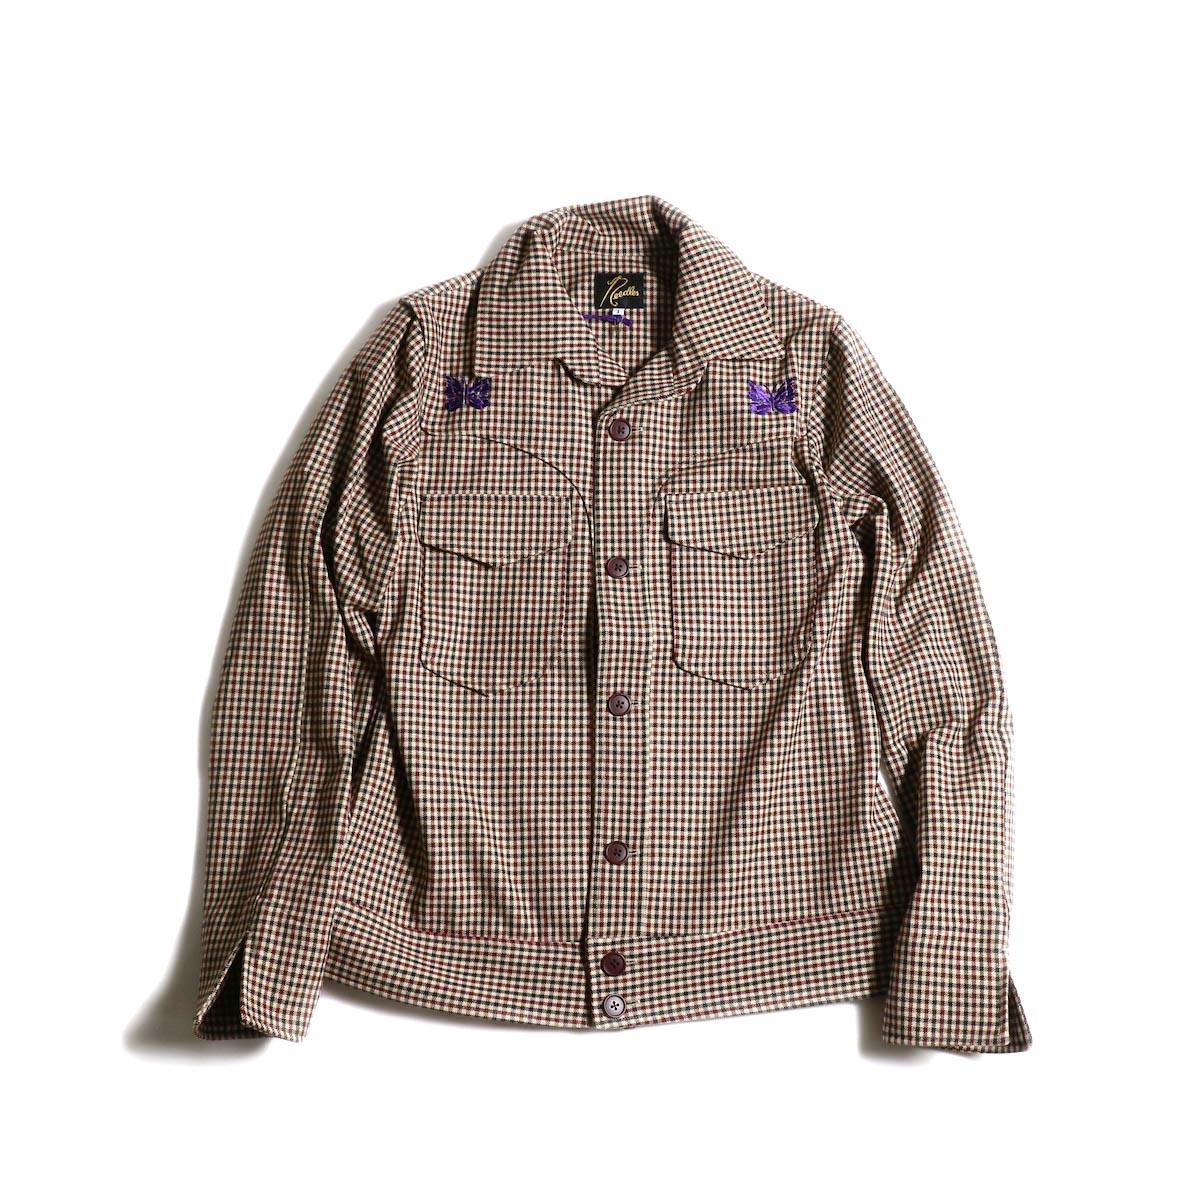 Needles / Cowboy Leisure Jacket -Gunclub Plaid (Bordeaux)